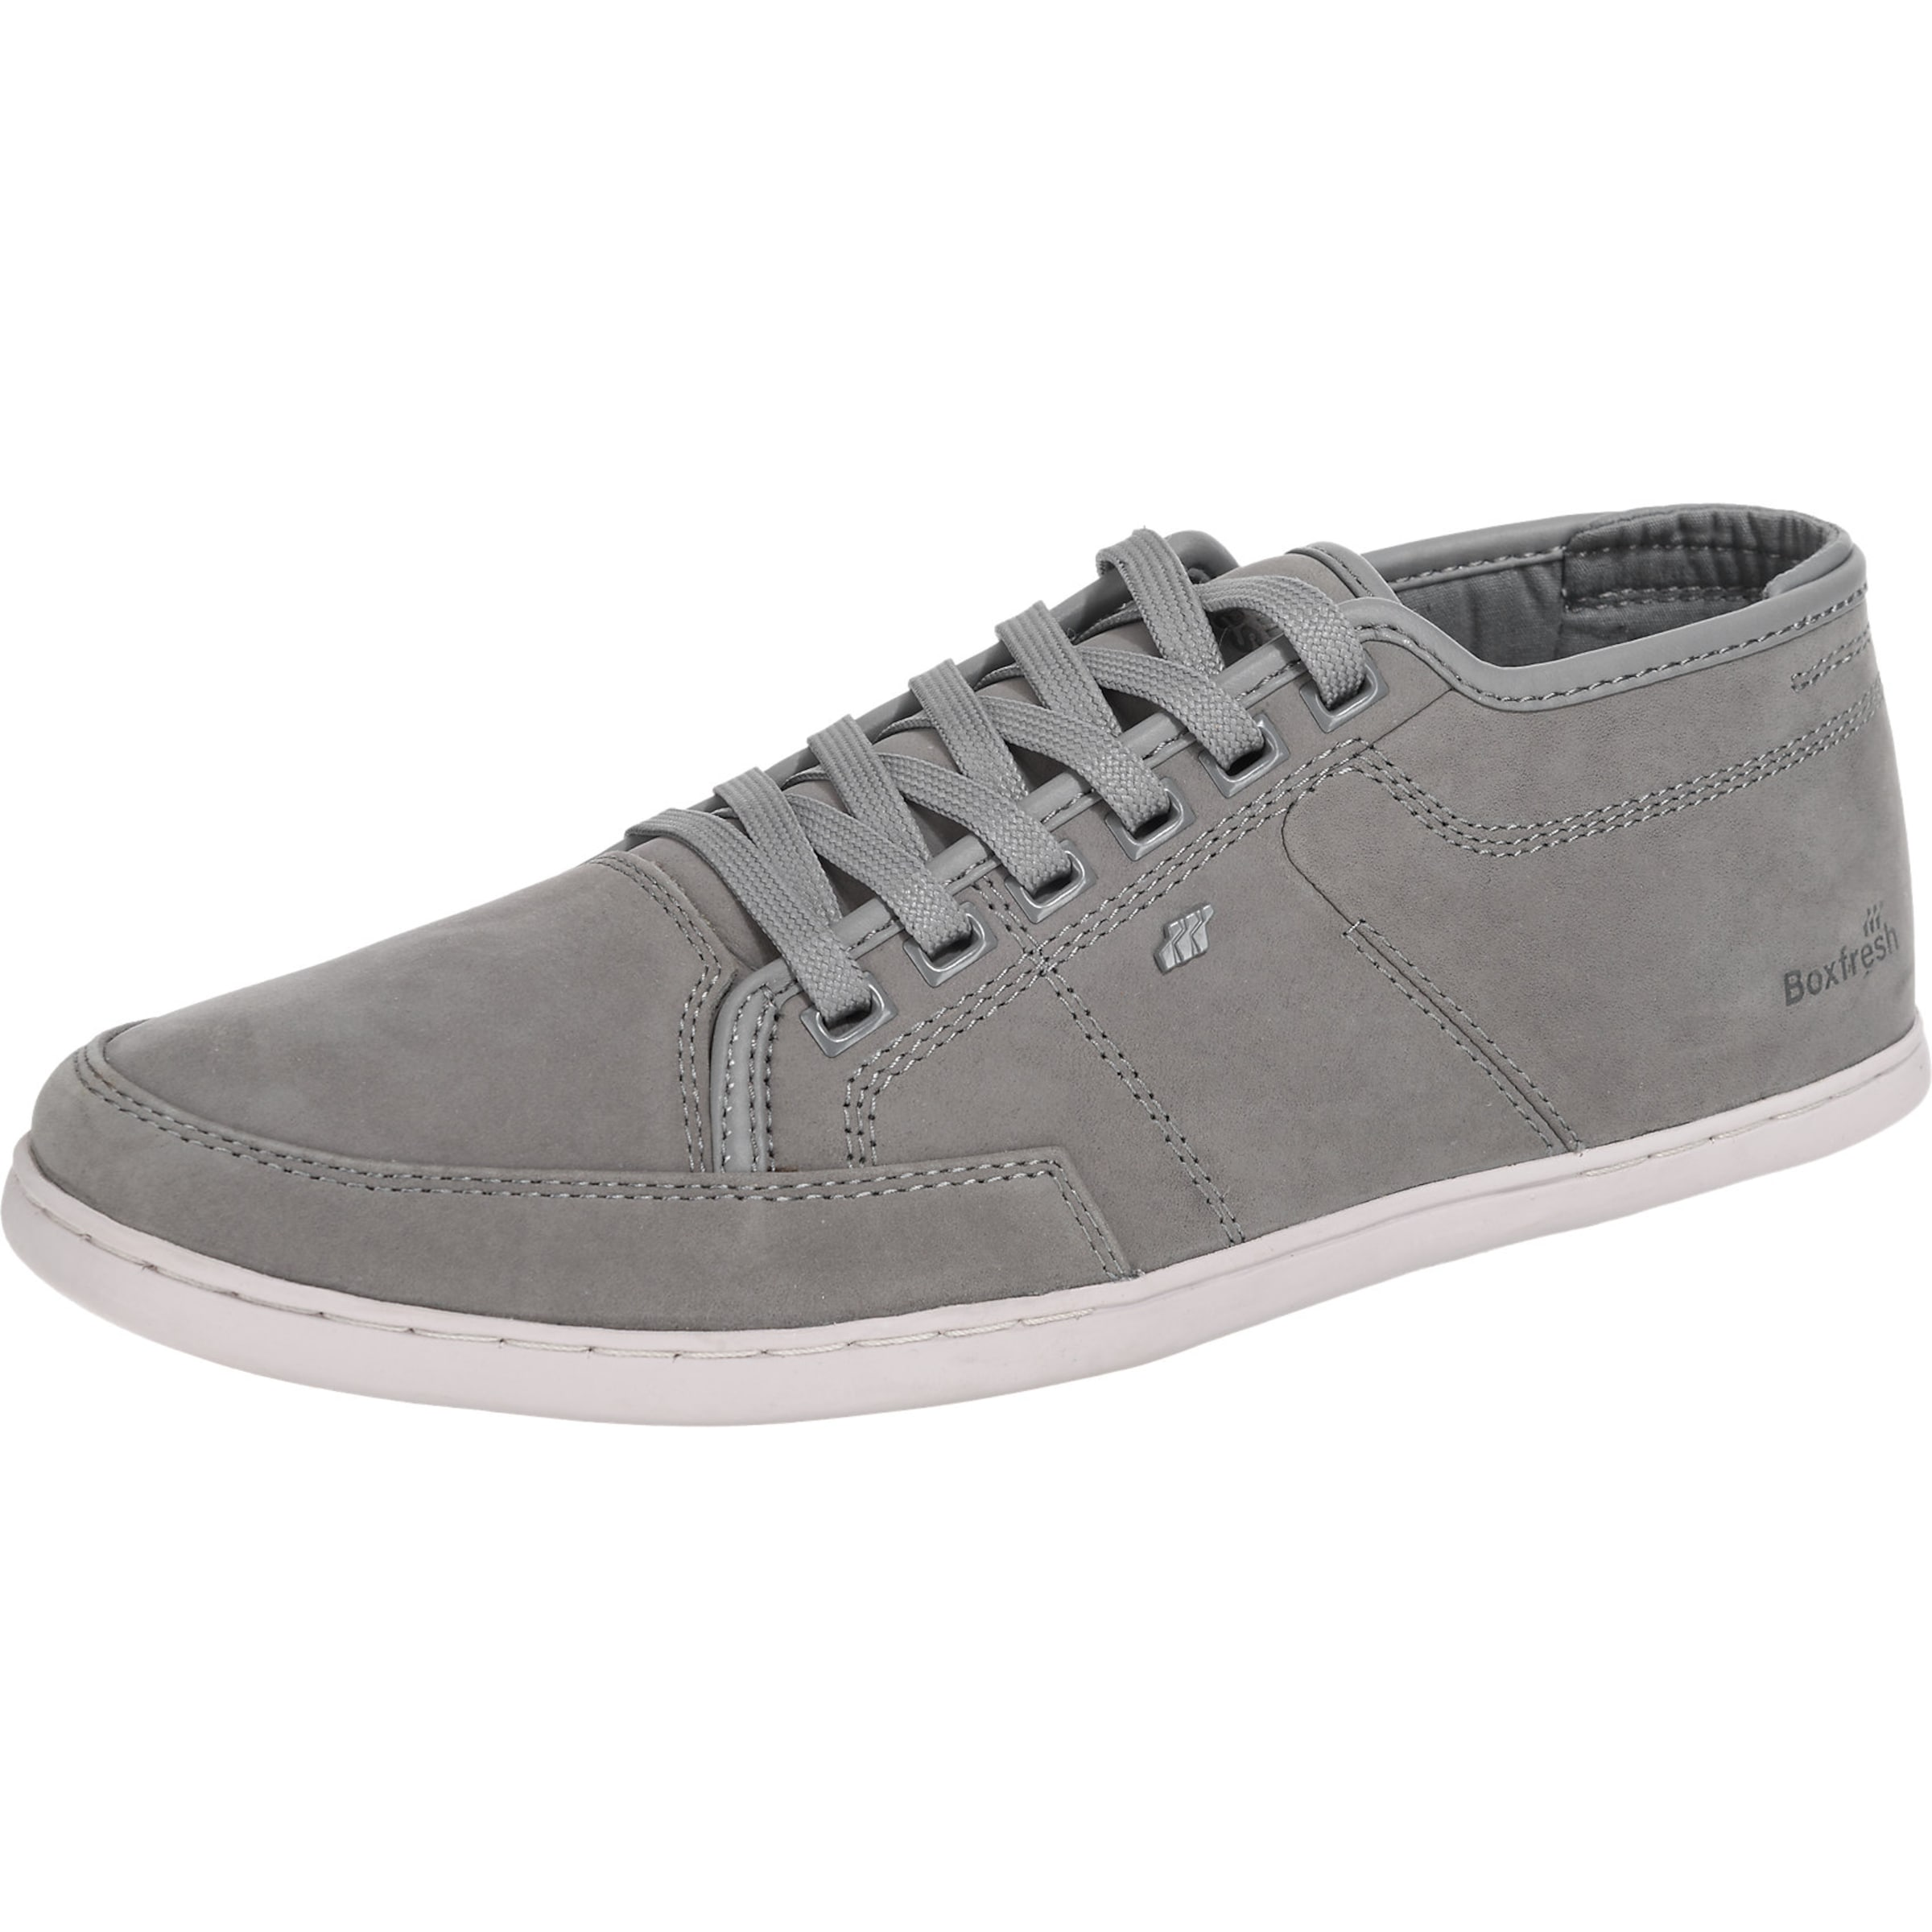 BOXFRESH Sparko Sneakers Günstige und langlebige Schuhe